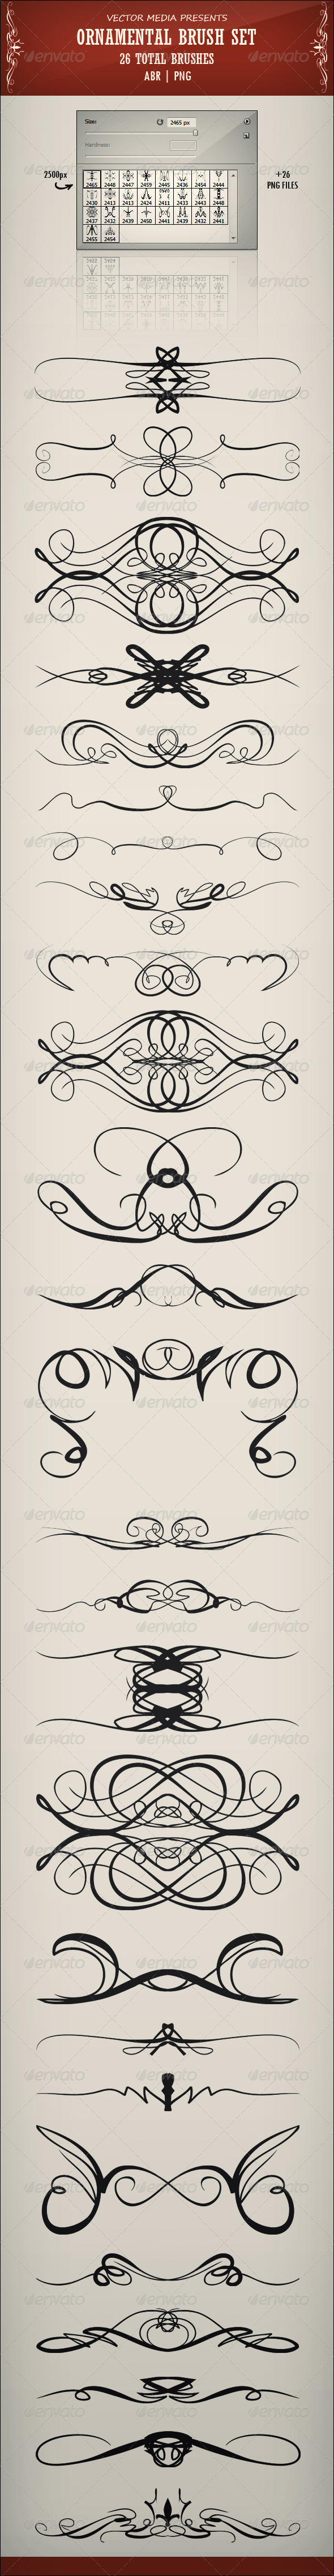 GraphicRiver Ornamental Brush Set 3421666